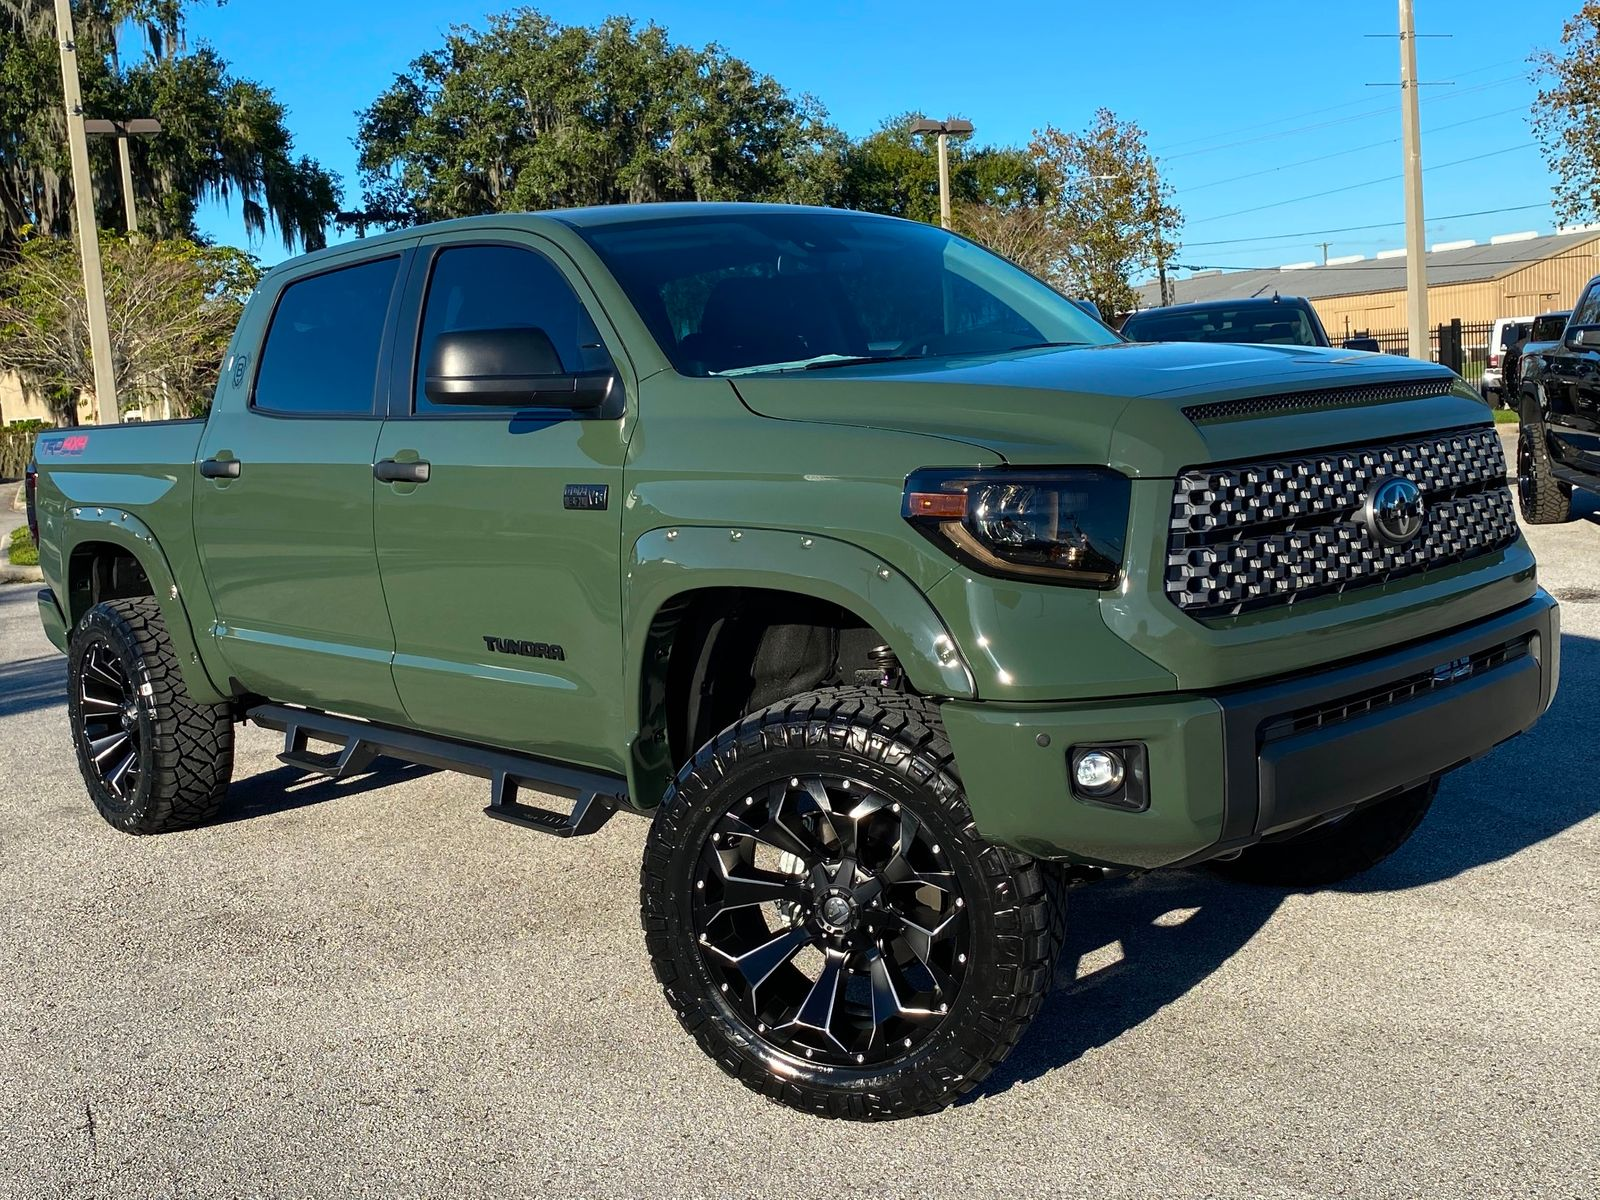 2021 Toyota Tundra Army Trd Pro Custom Lifted Leather Crewmax Plant City Florida Bayshore Automotive